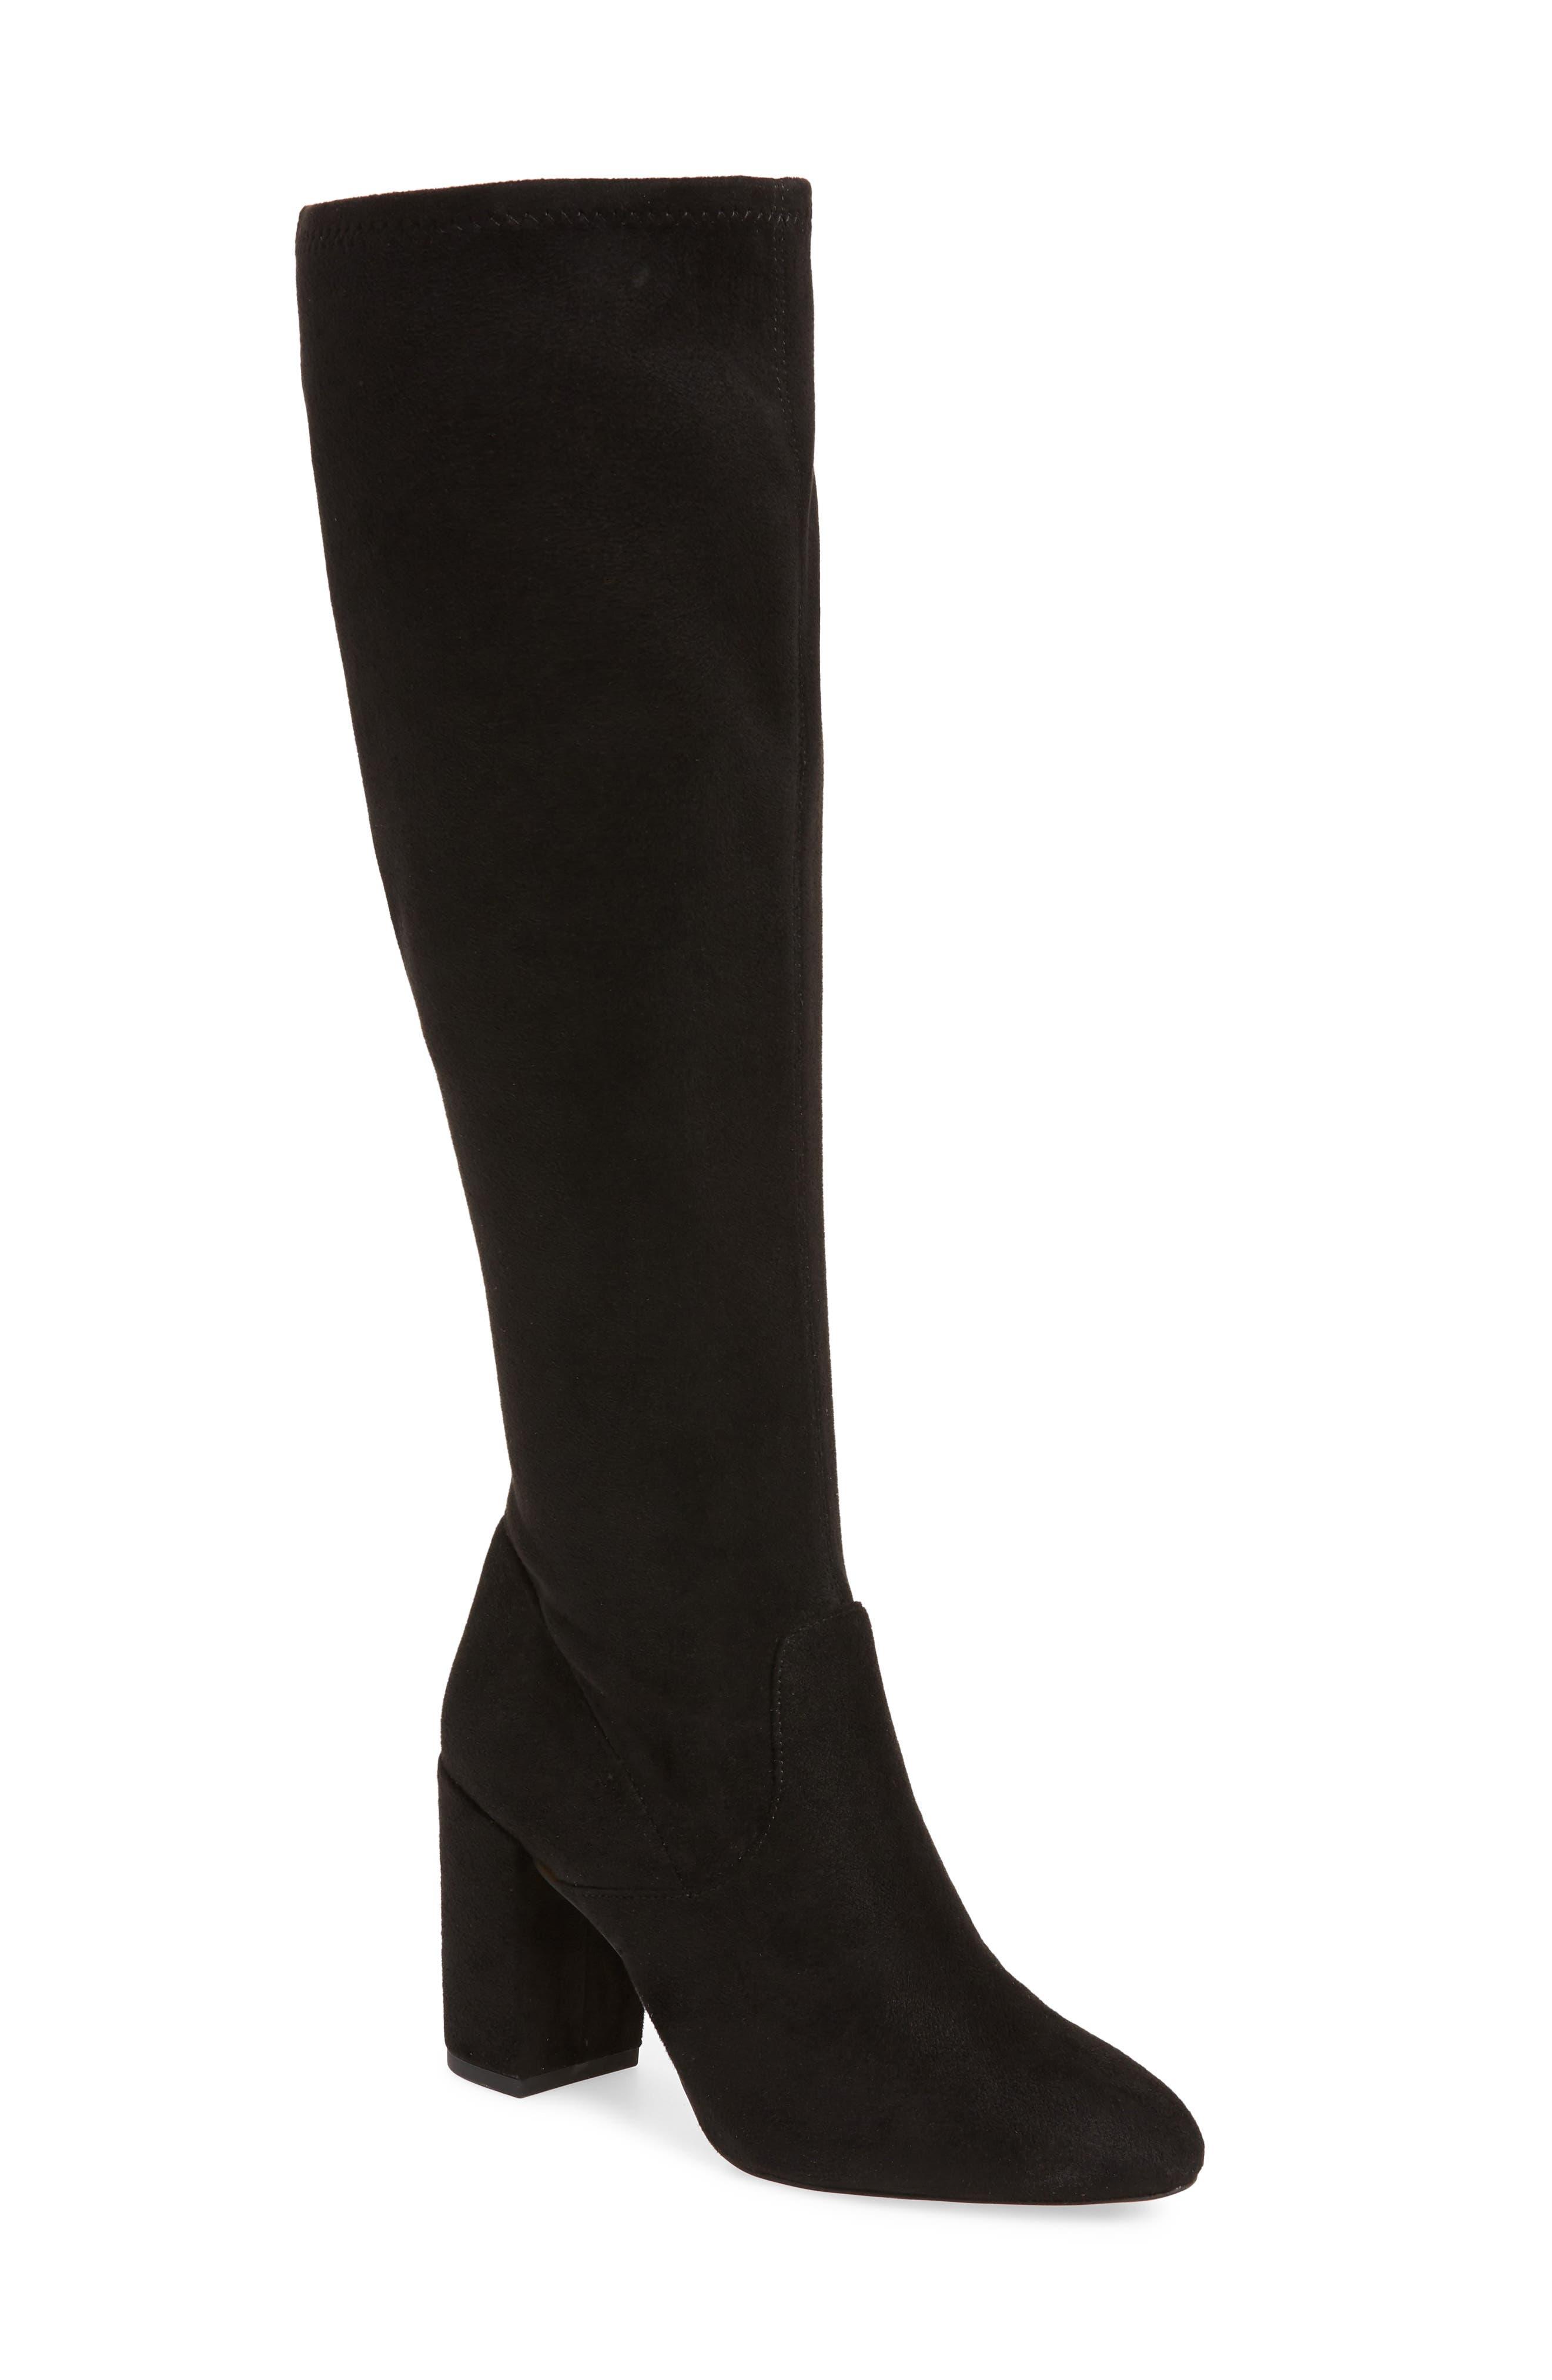 REBECCA MINKOFF Gillian Knee High Boot, Main, color, 001